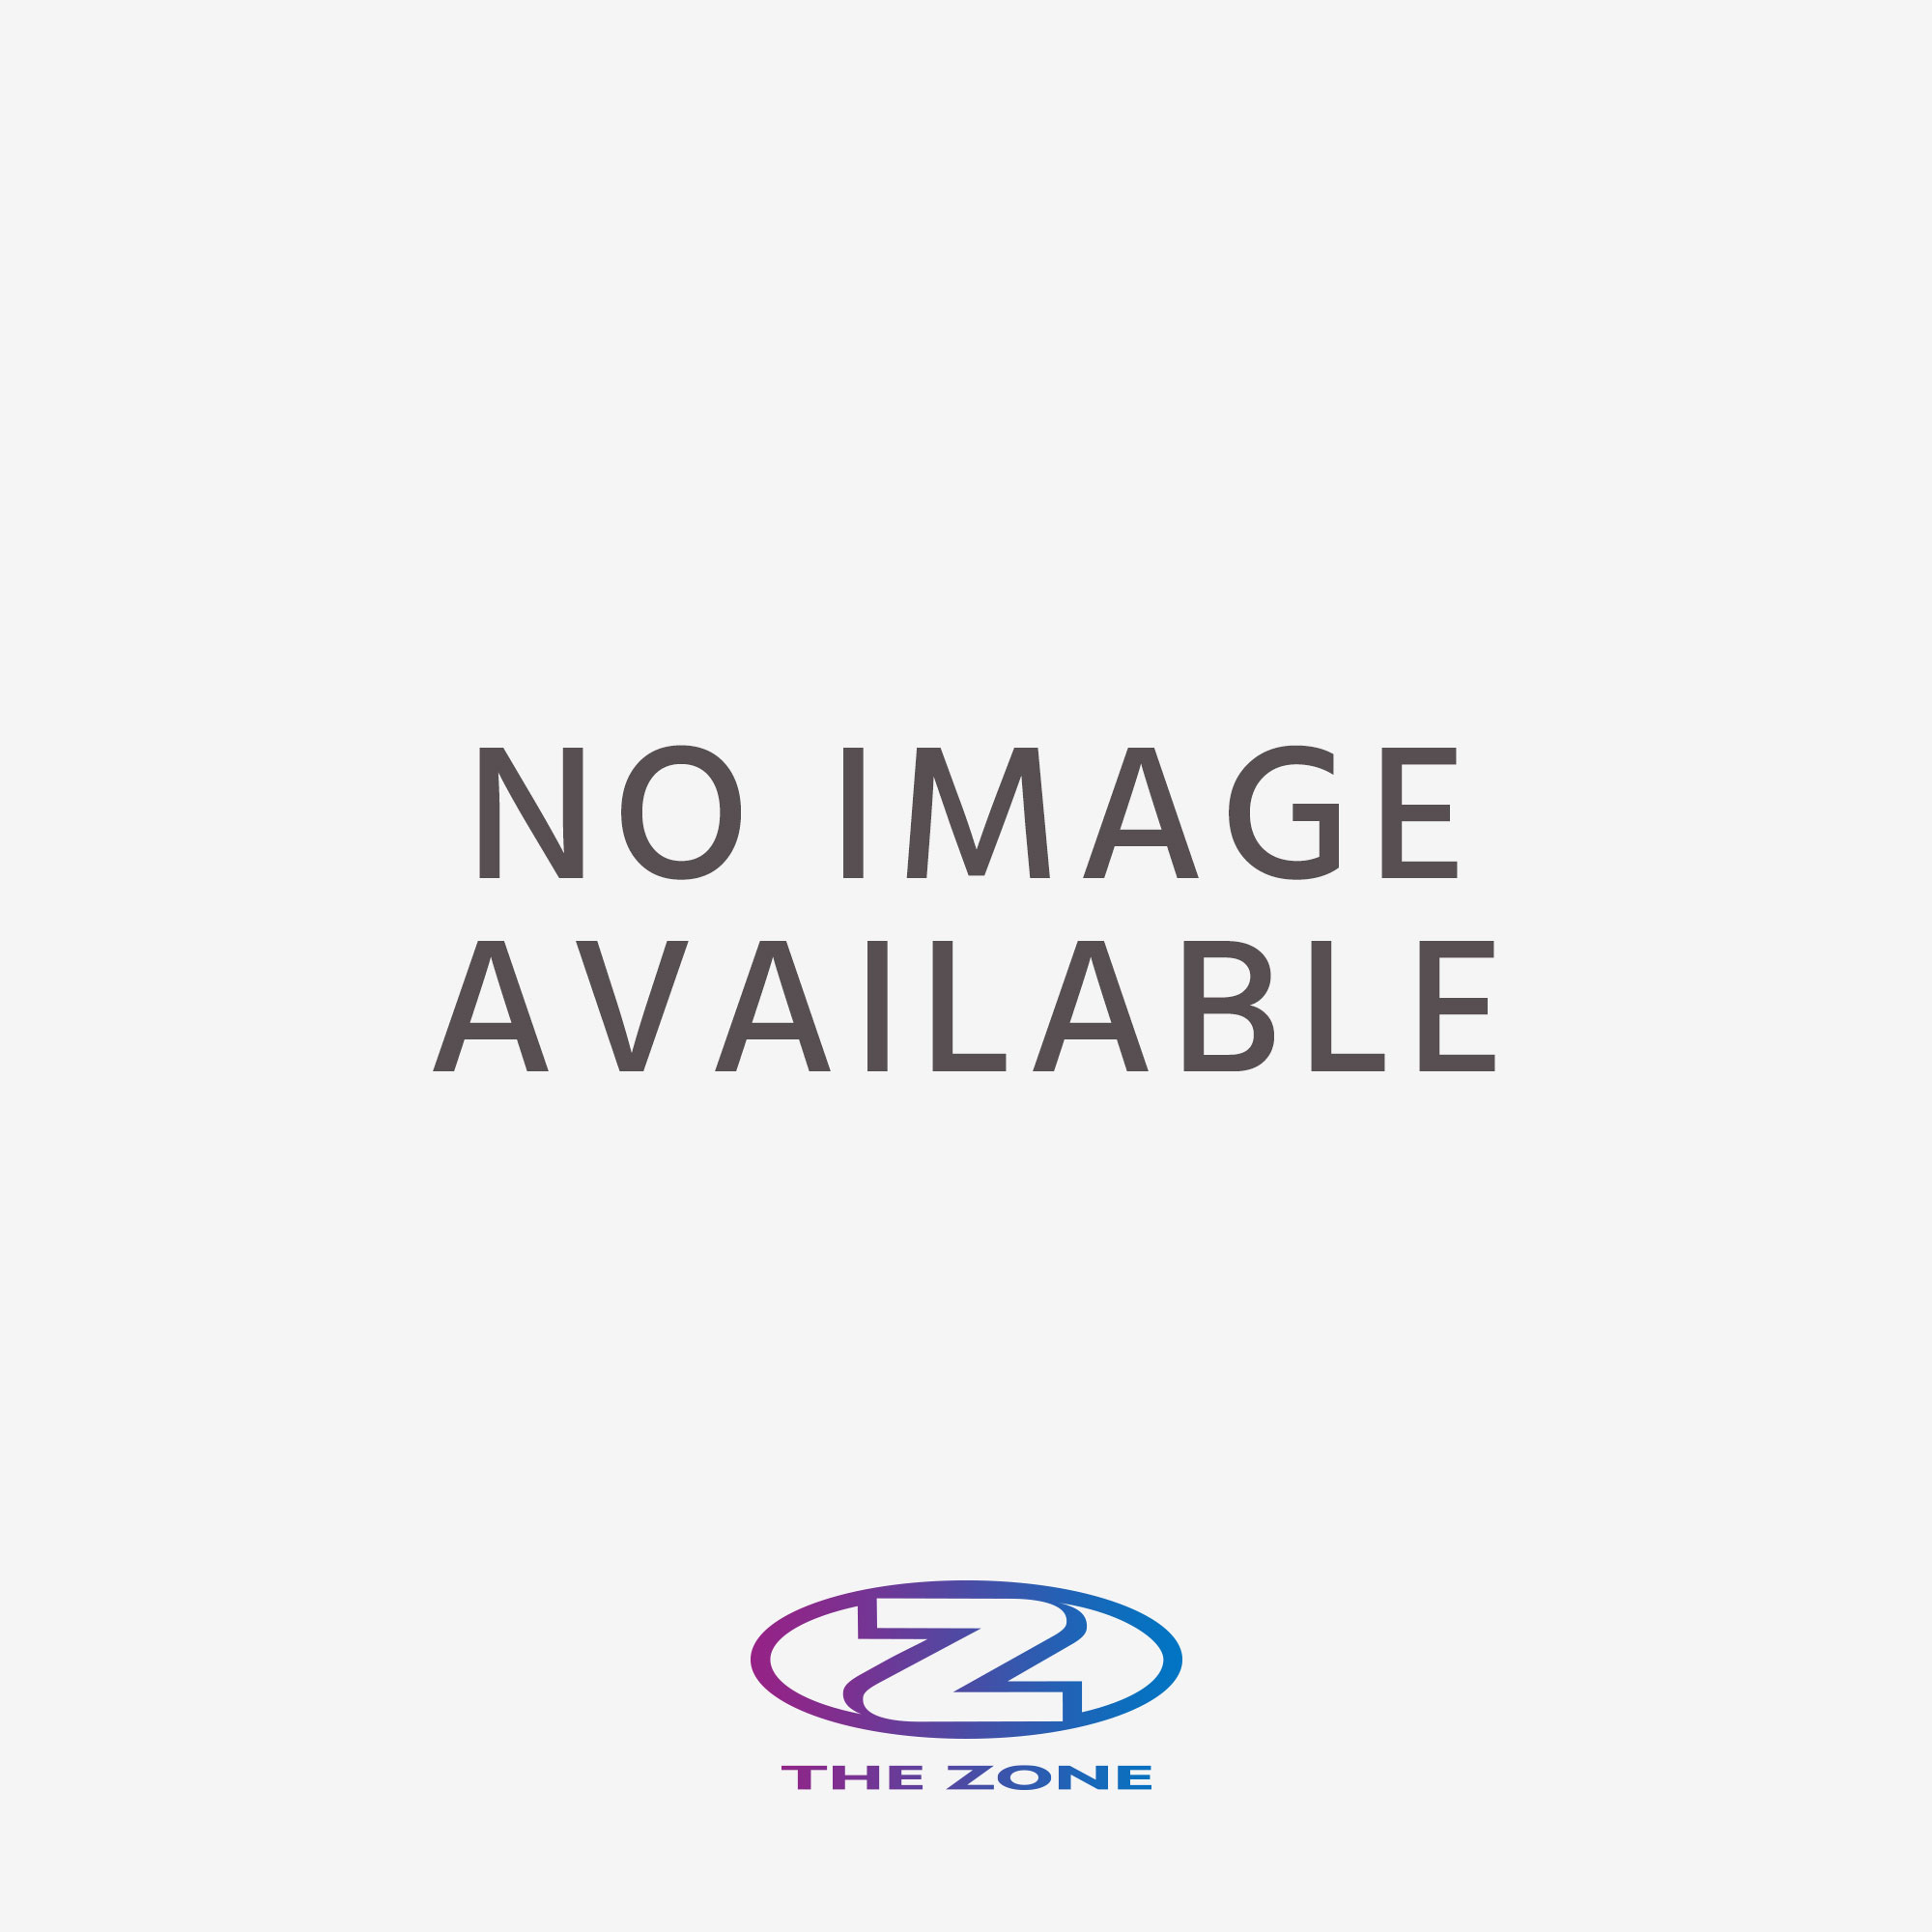 621fbb9c4cbe4 Nova Girls  Crystal Sleeveless Gymnastics Leotard